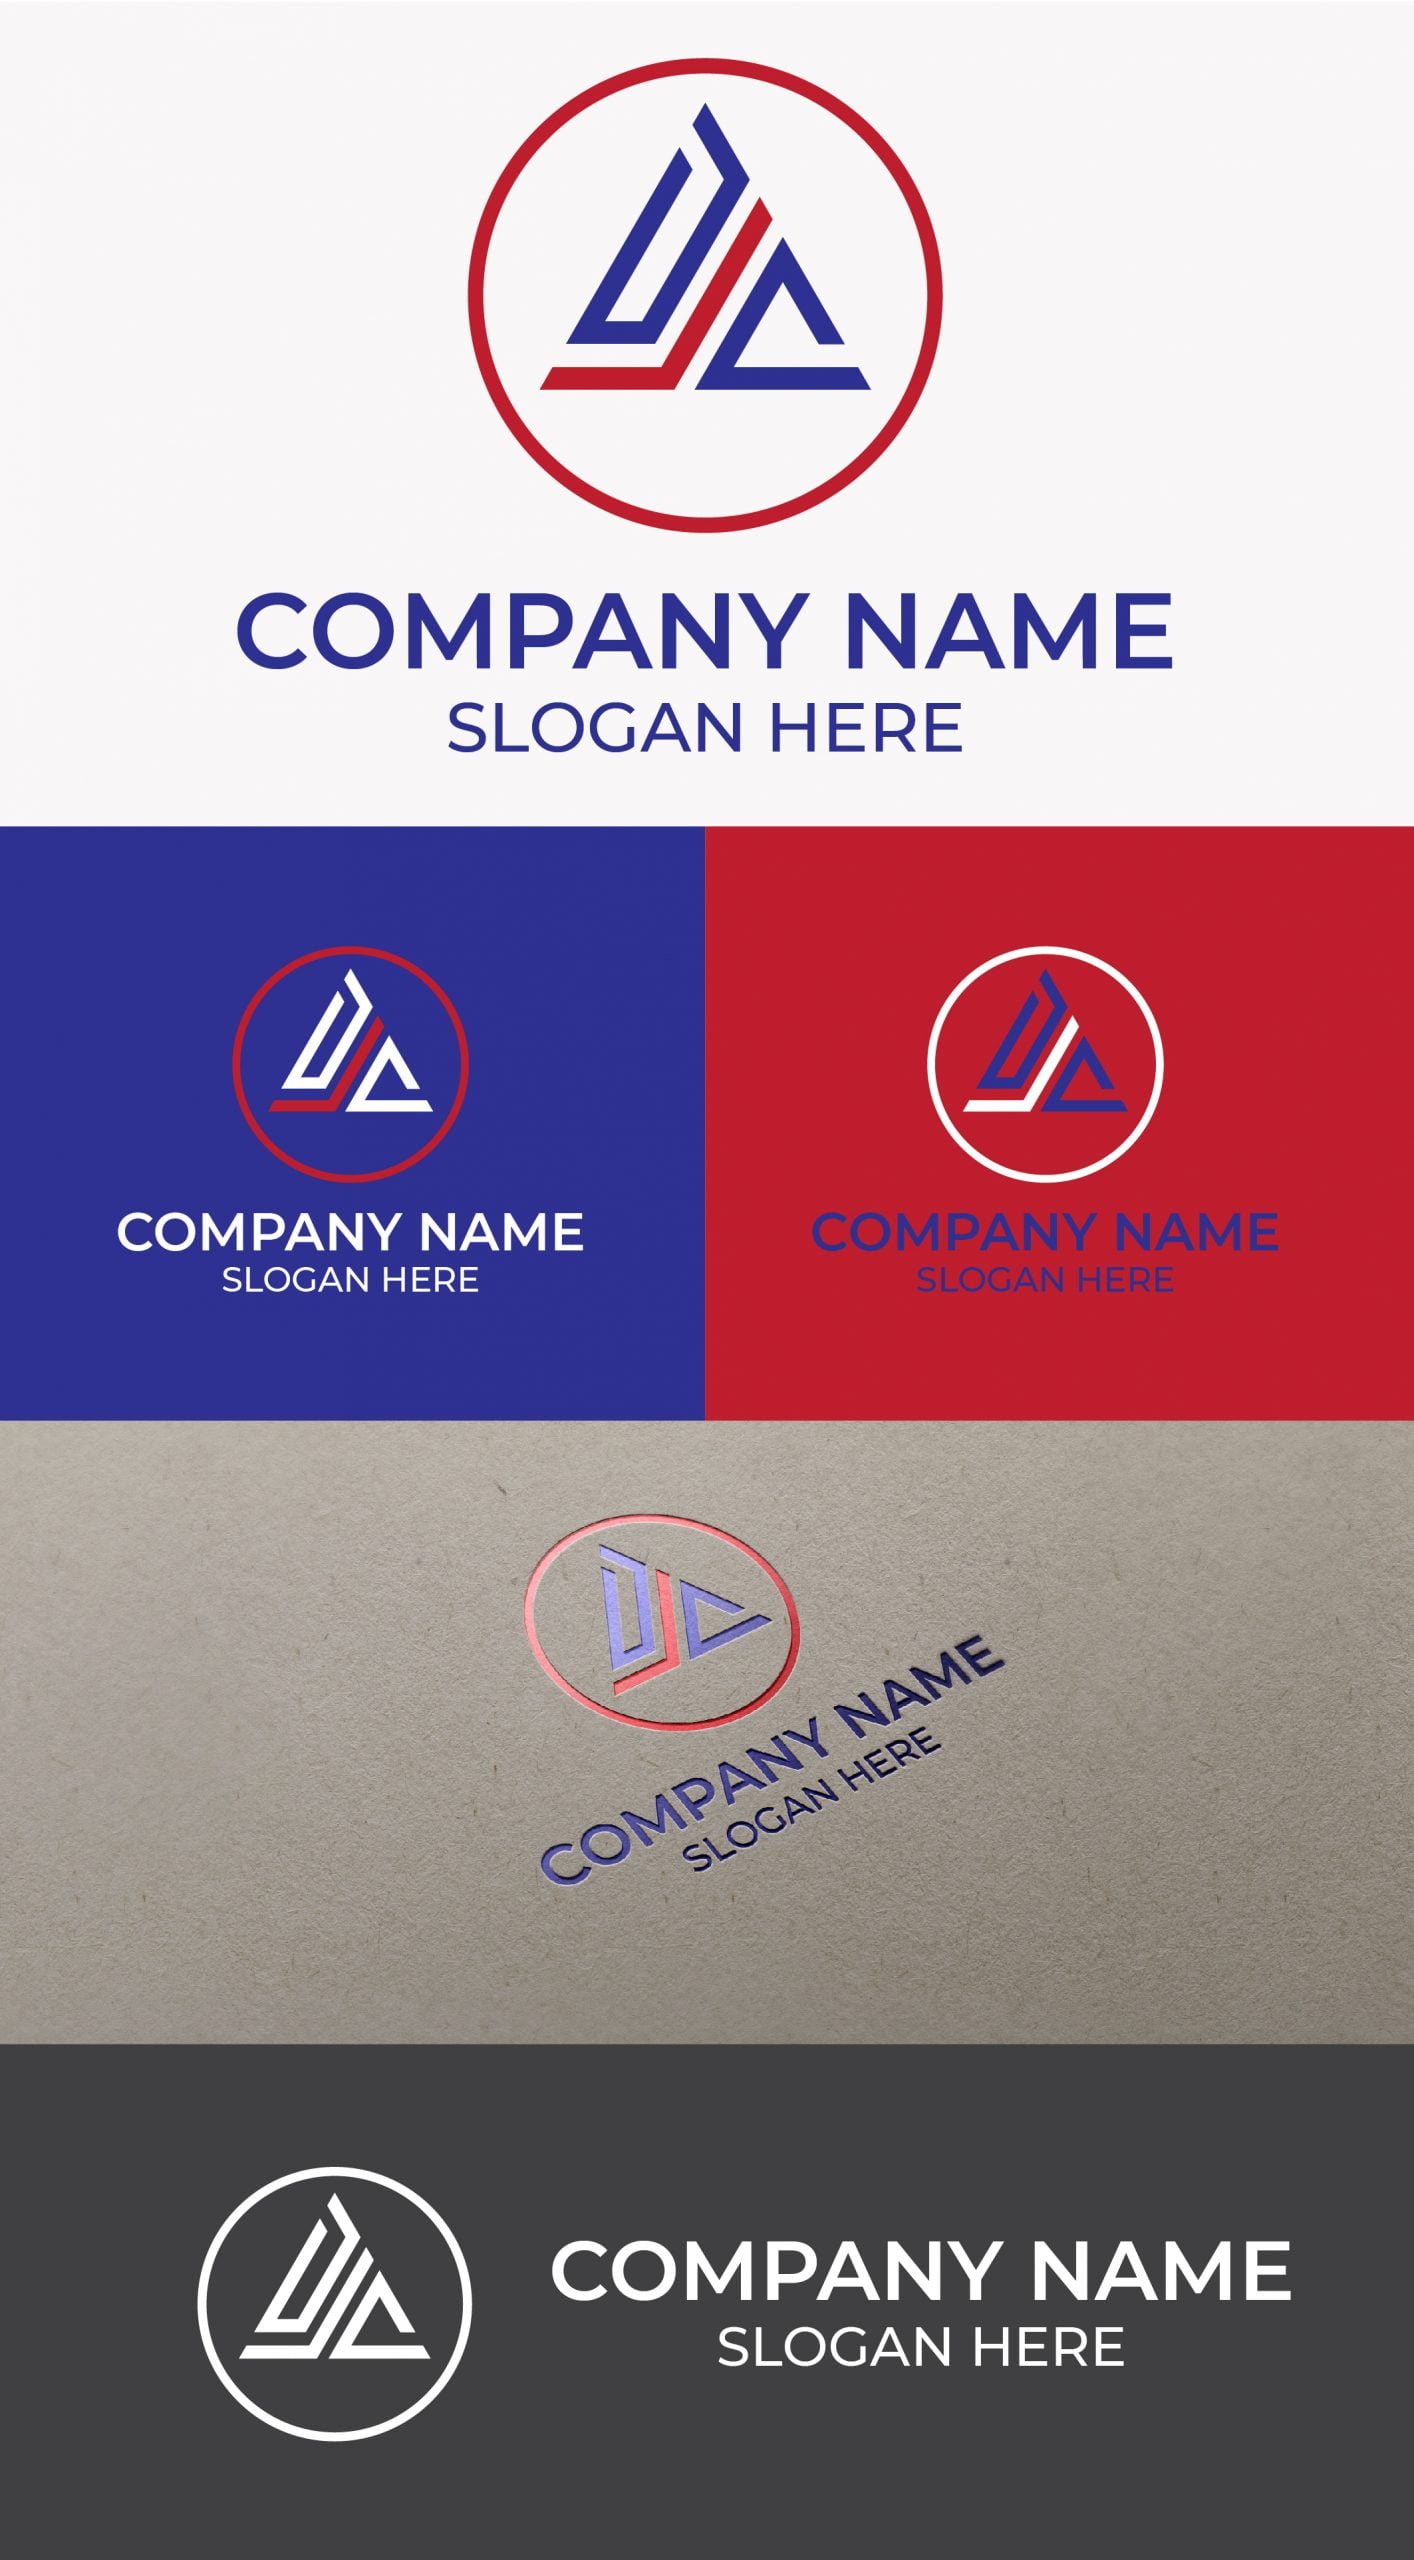 DJC Logo Free Template